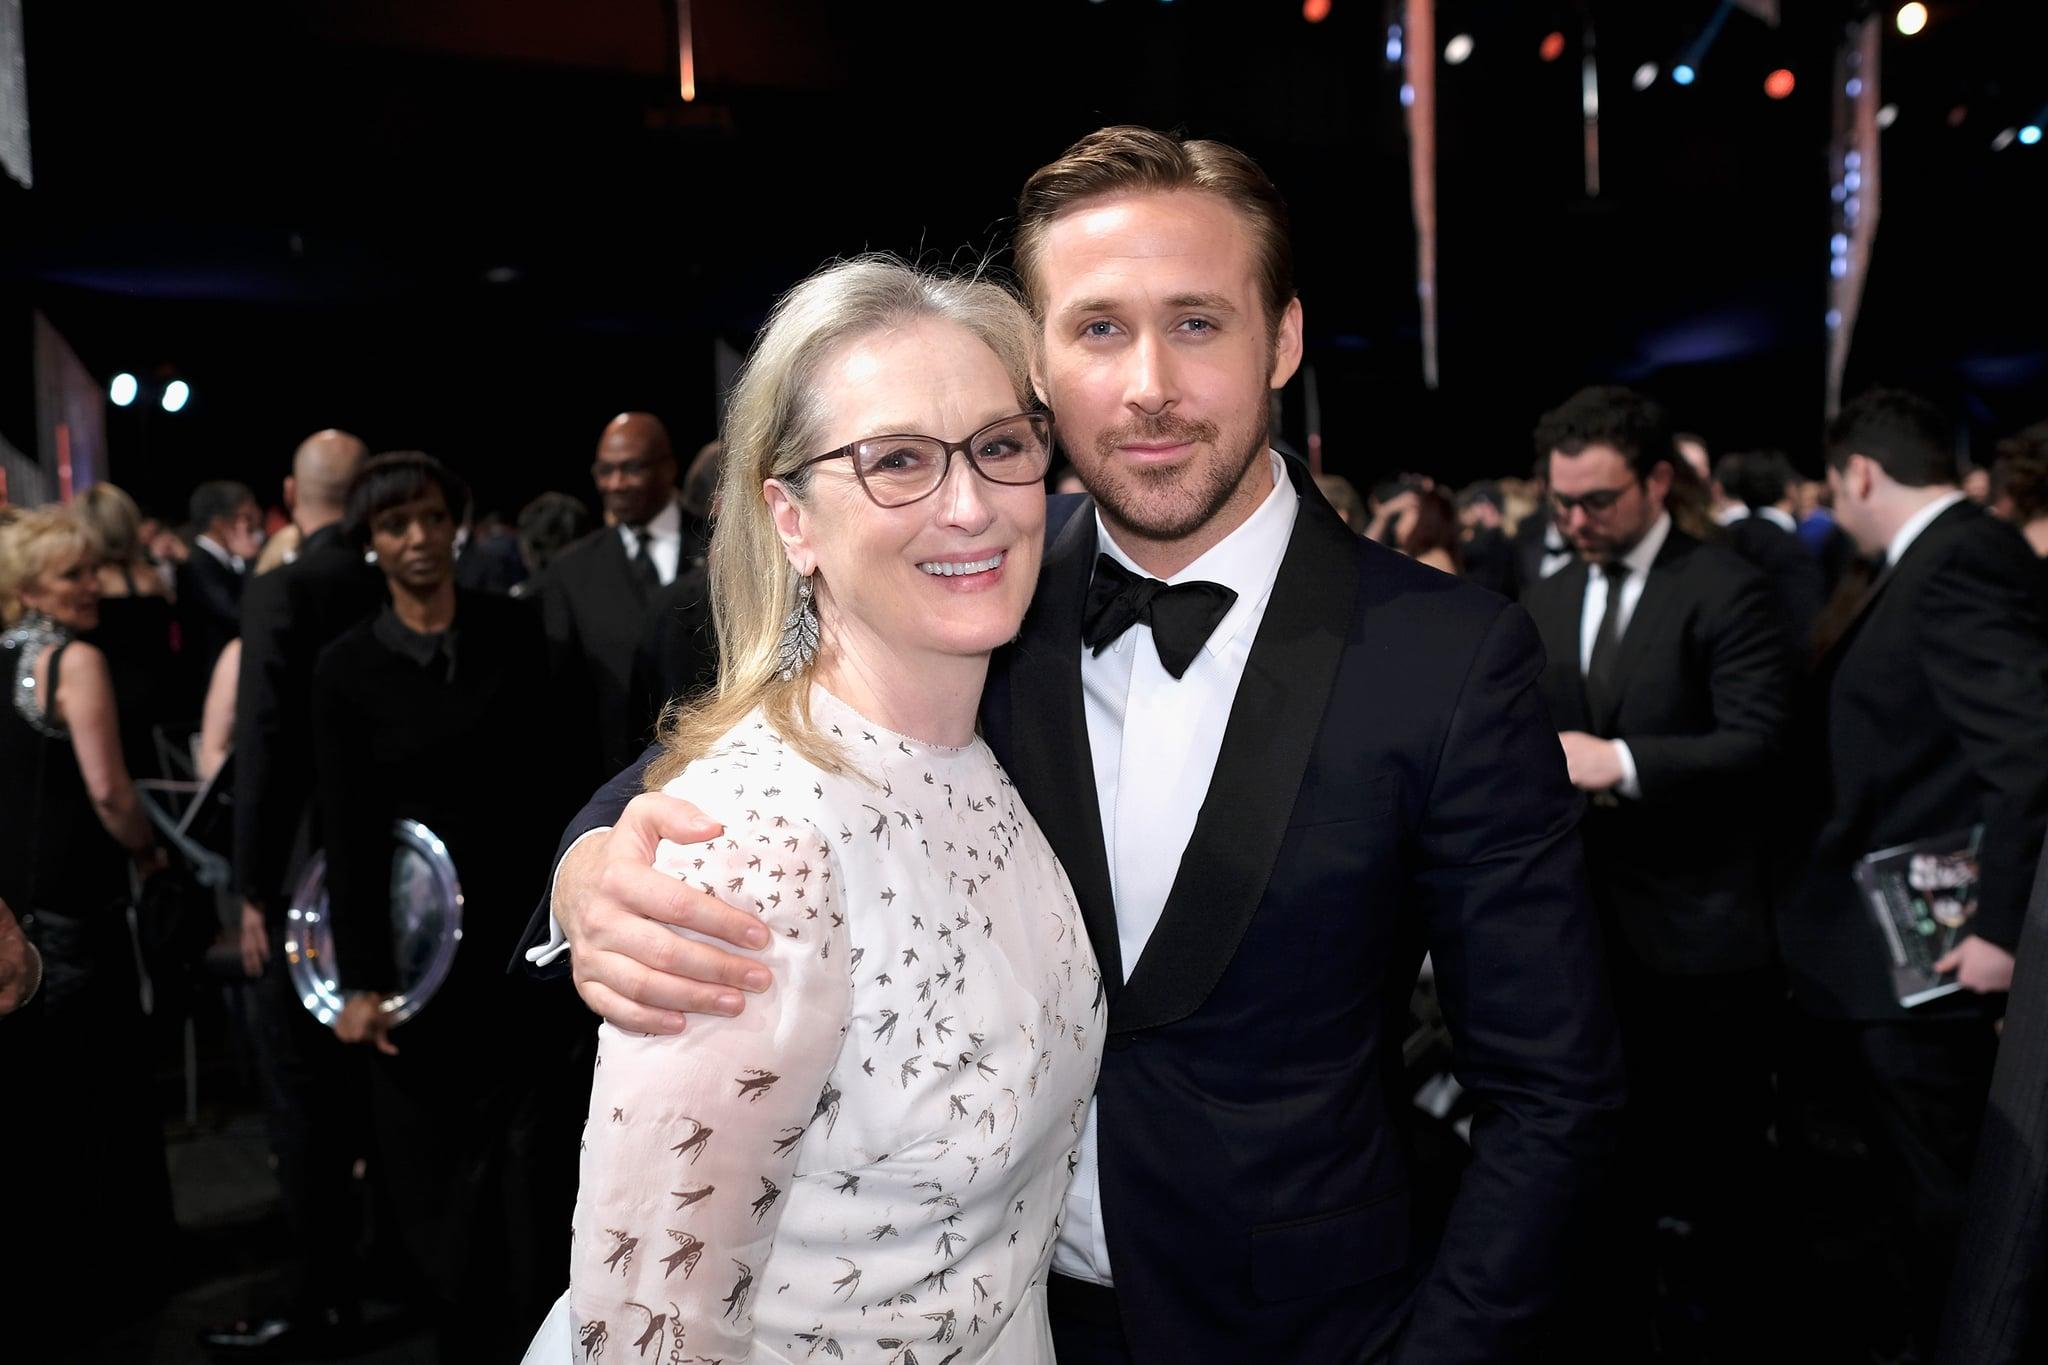 Meryl Streep helping Ryan Gosling tie his bow tie at the SAG awards 2019 is everything